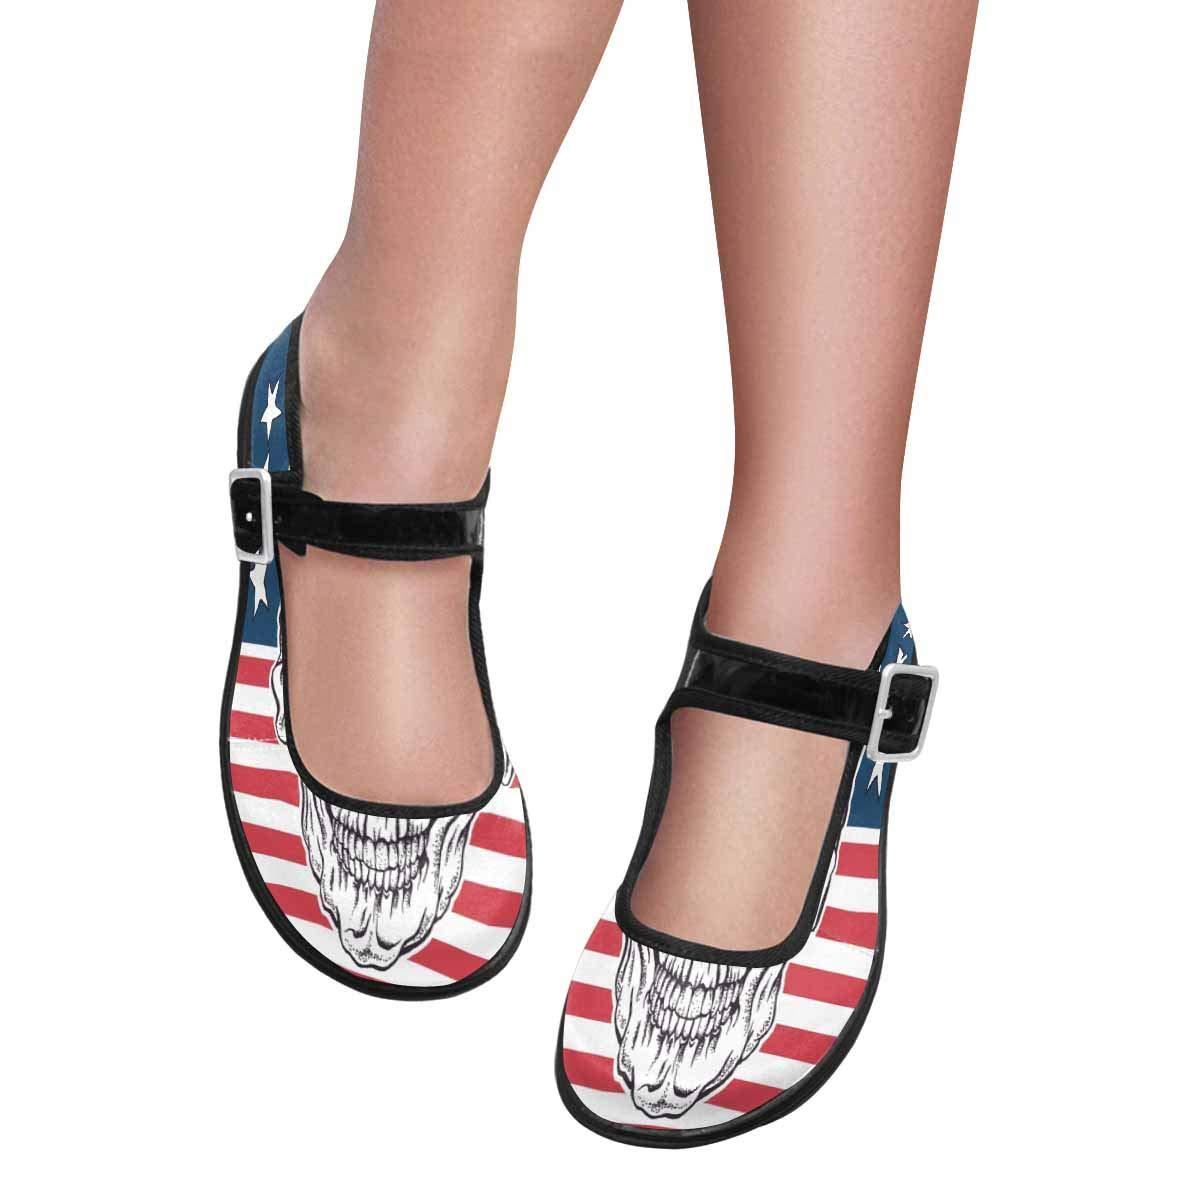 InterestPrint Women's Comfy Mary Jane Flats Walking Casual Shoes Sugar Skull in Sunglasses US8